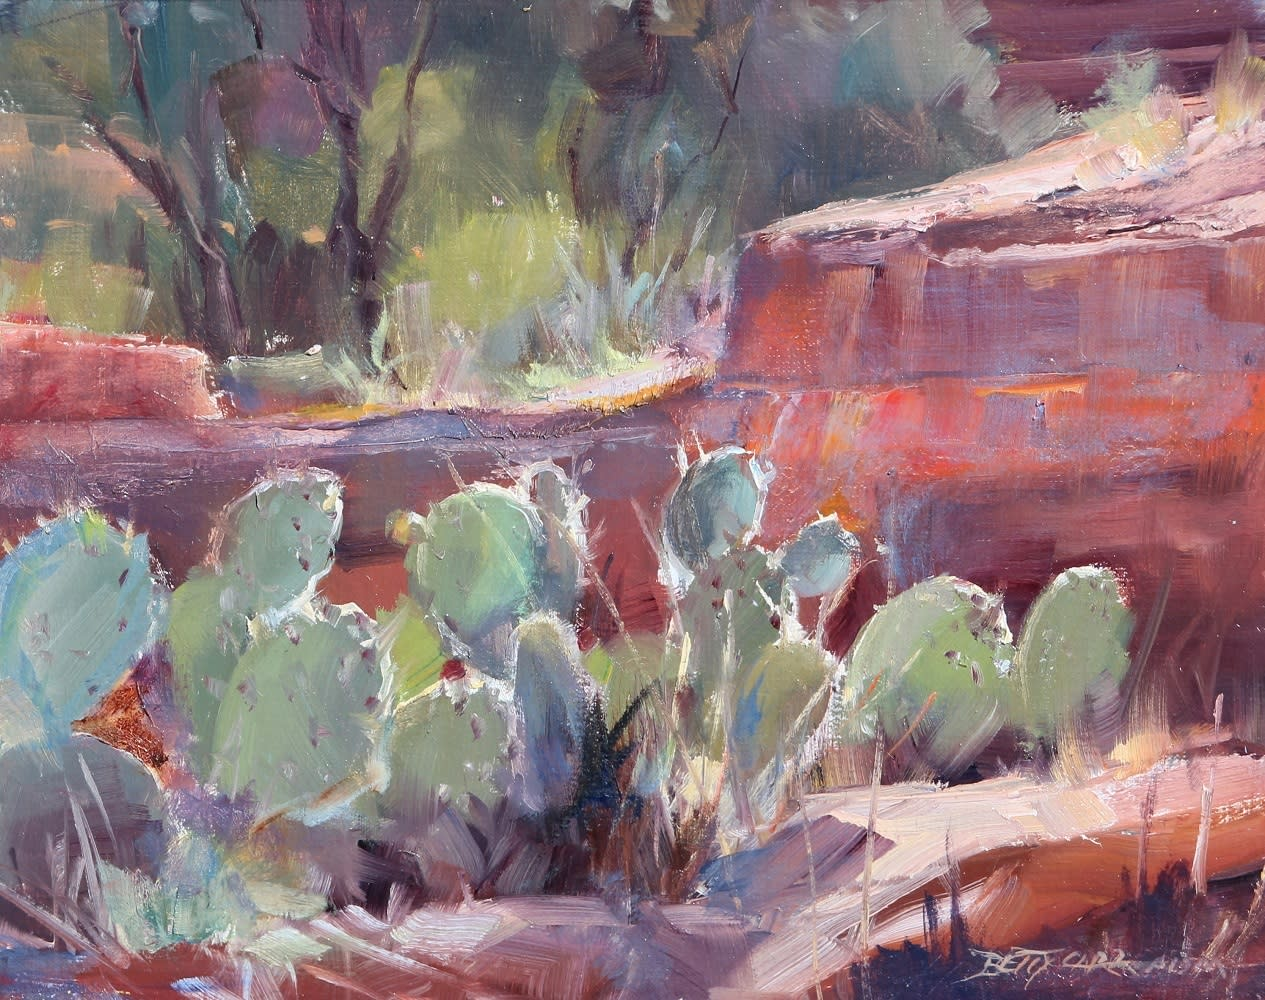 Betty carr cactus lights 11x14 1 100 ncjjug